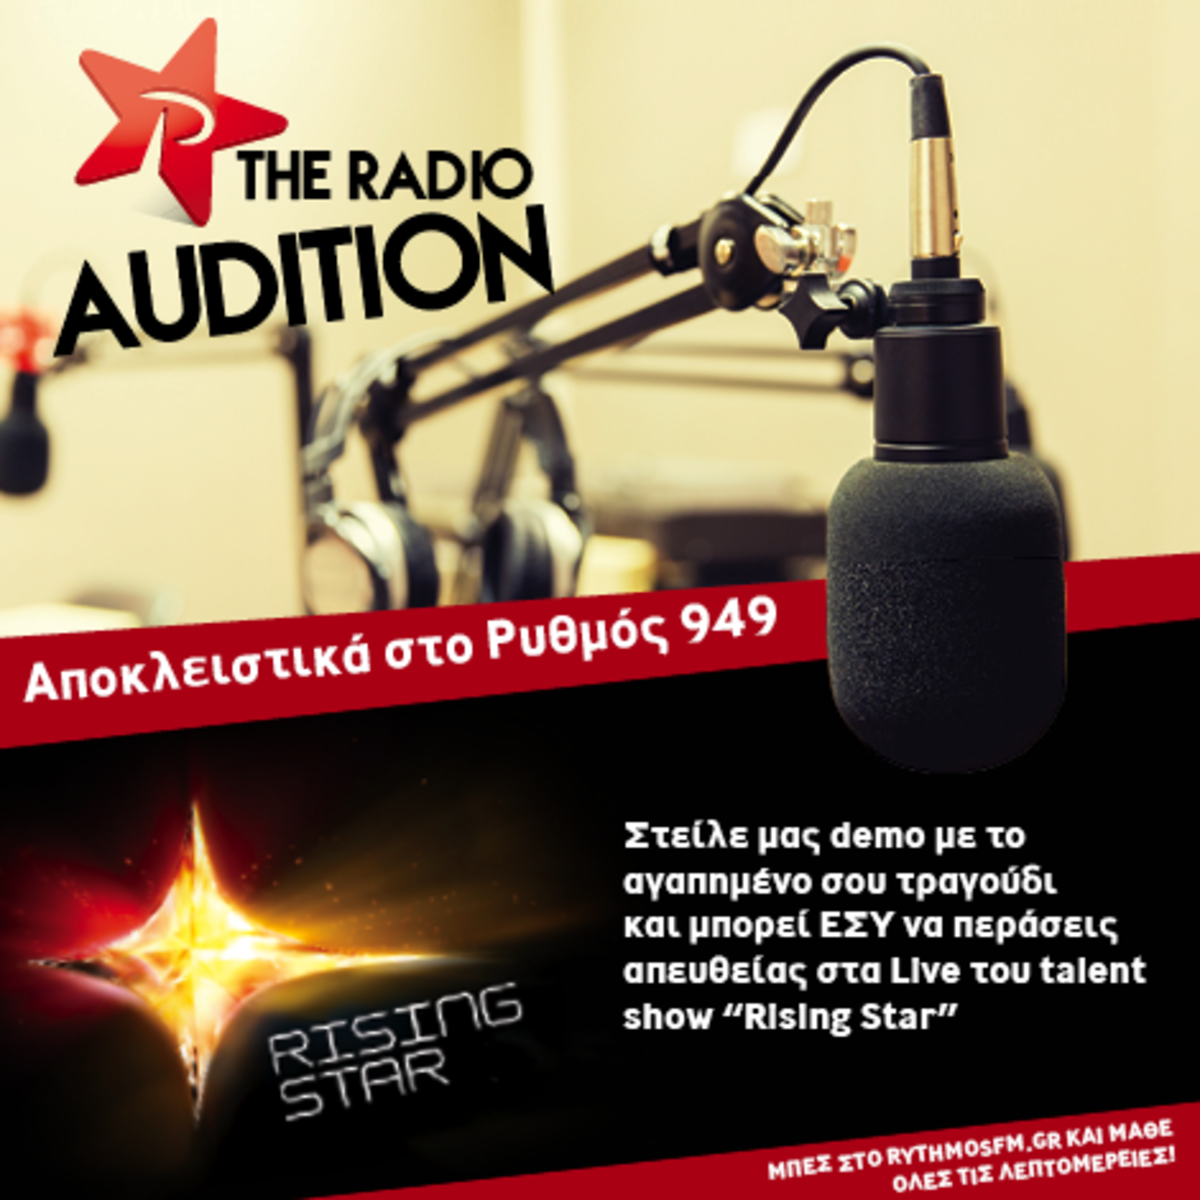 rising_star_radio_audition